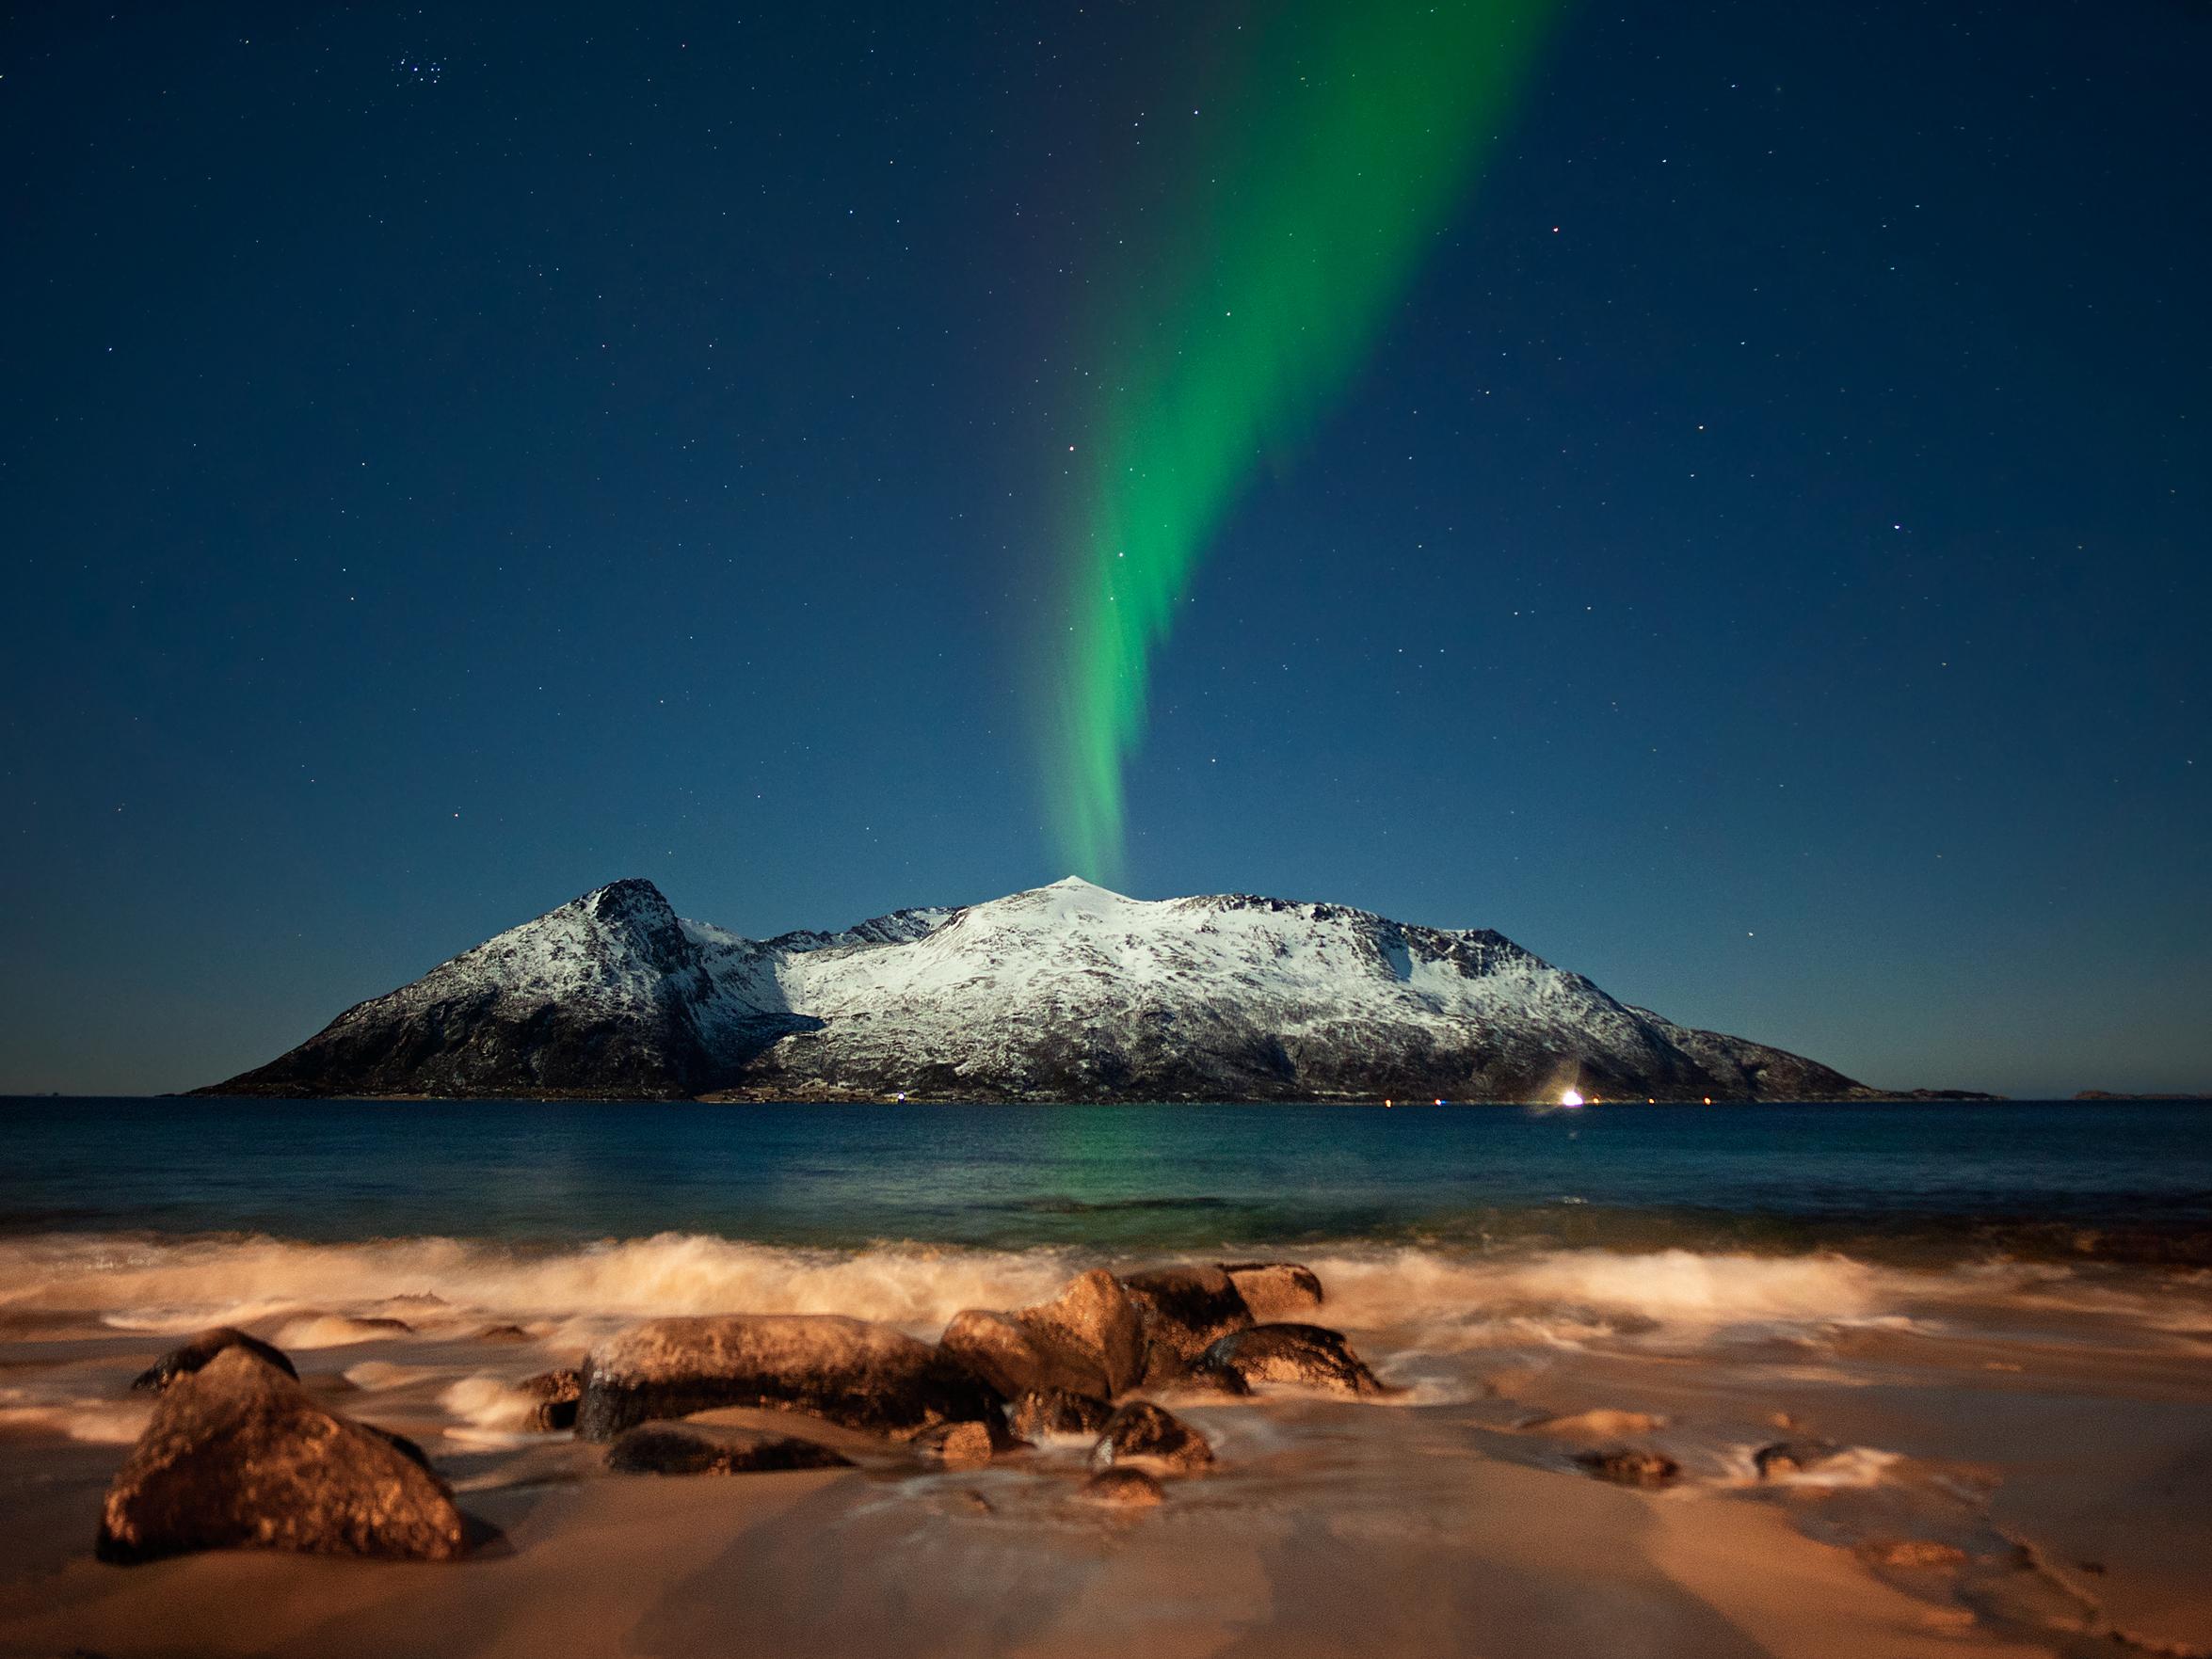 Wallpaper Landscape Lights Sea Night Galaxy Water Sand Red Sky Snow Winter Stars Beach Moon Green Norway Waves Volcano Horizon